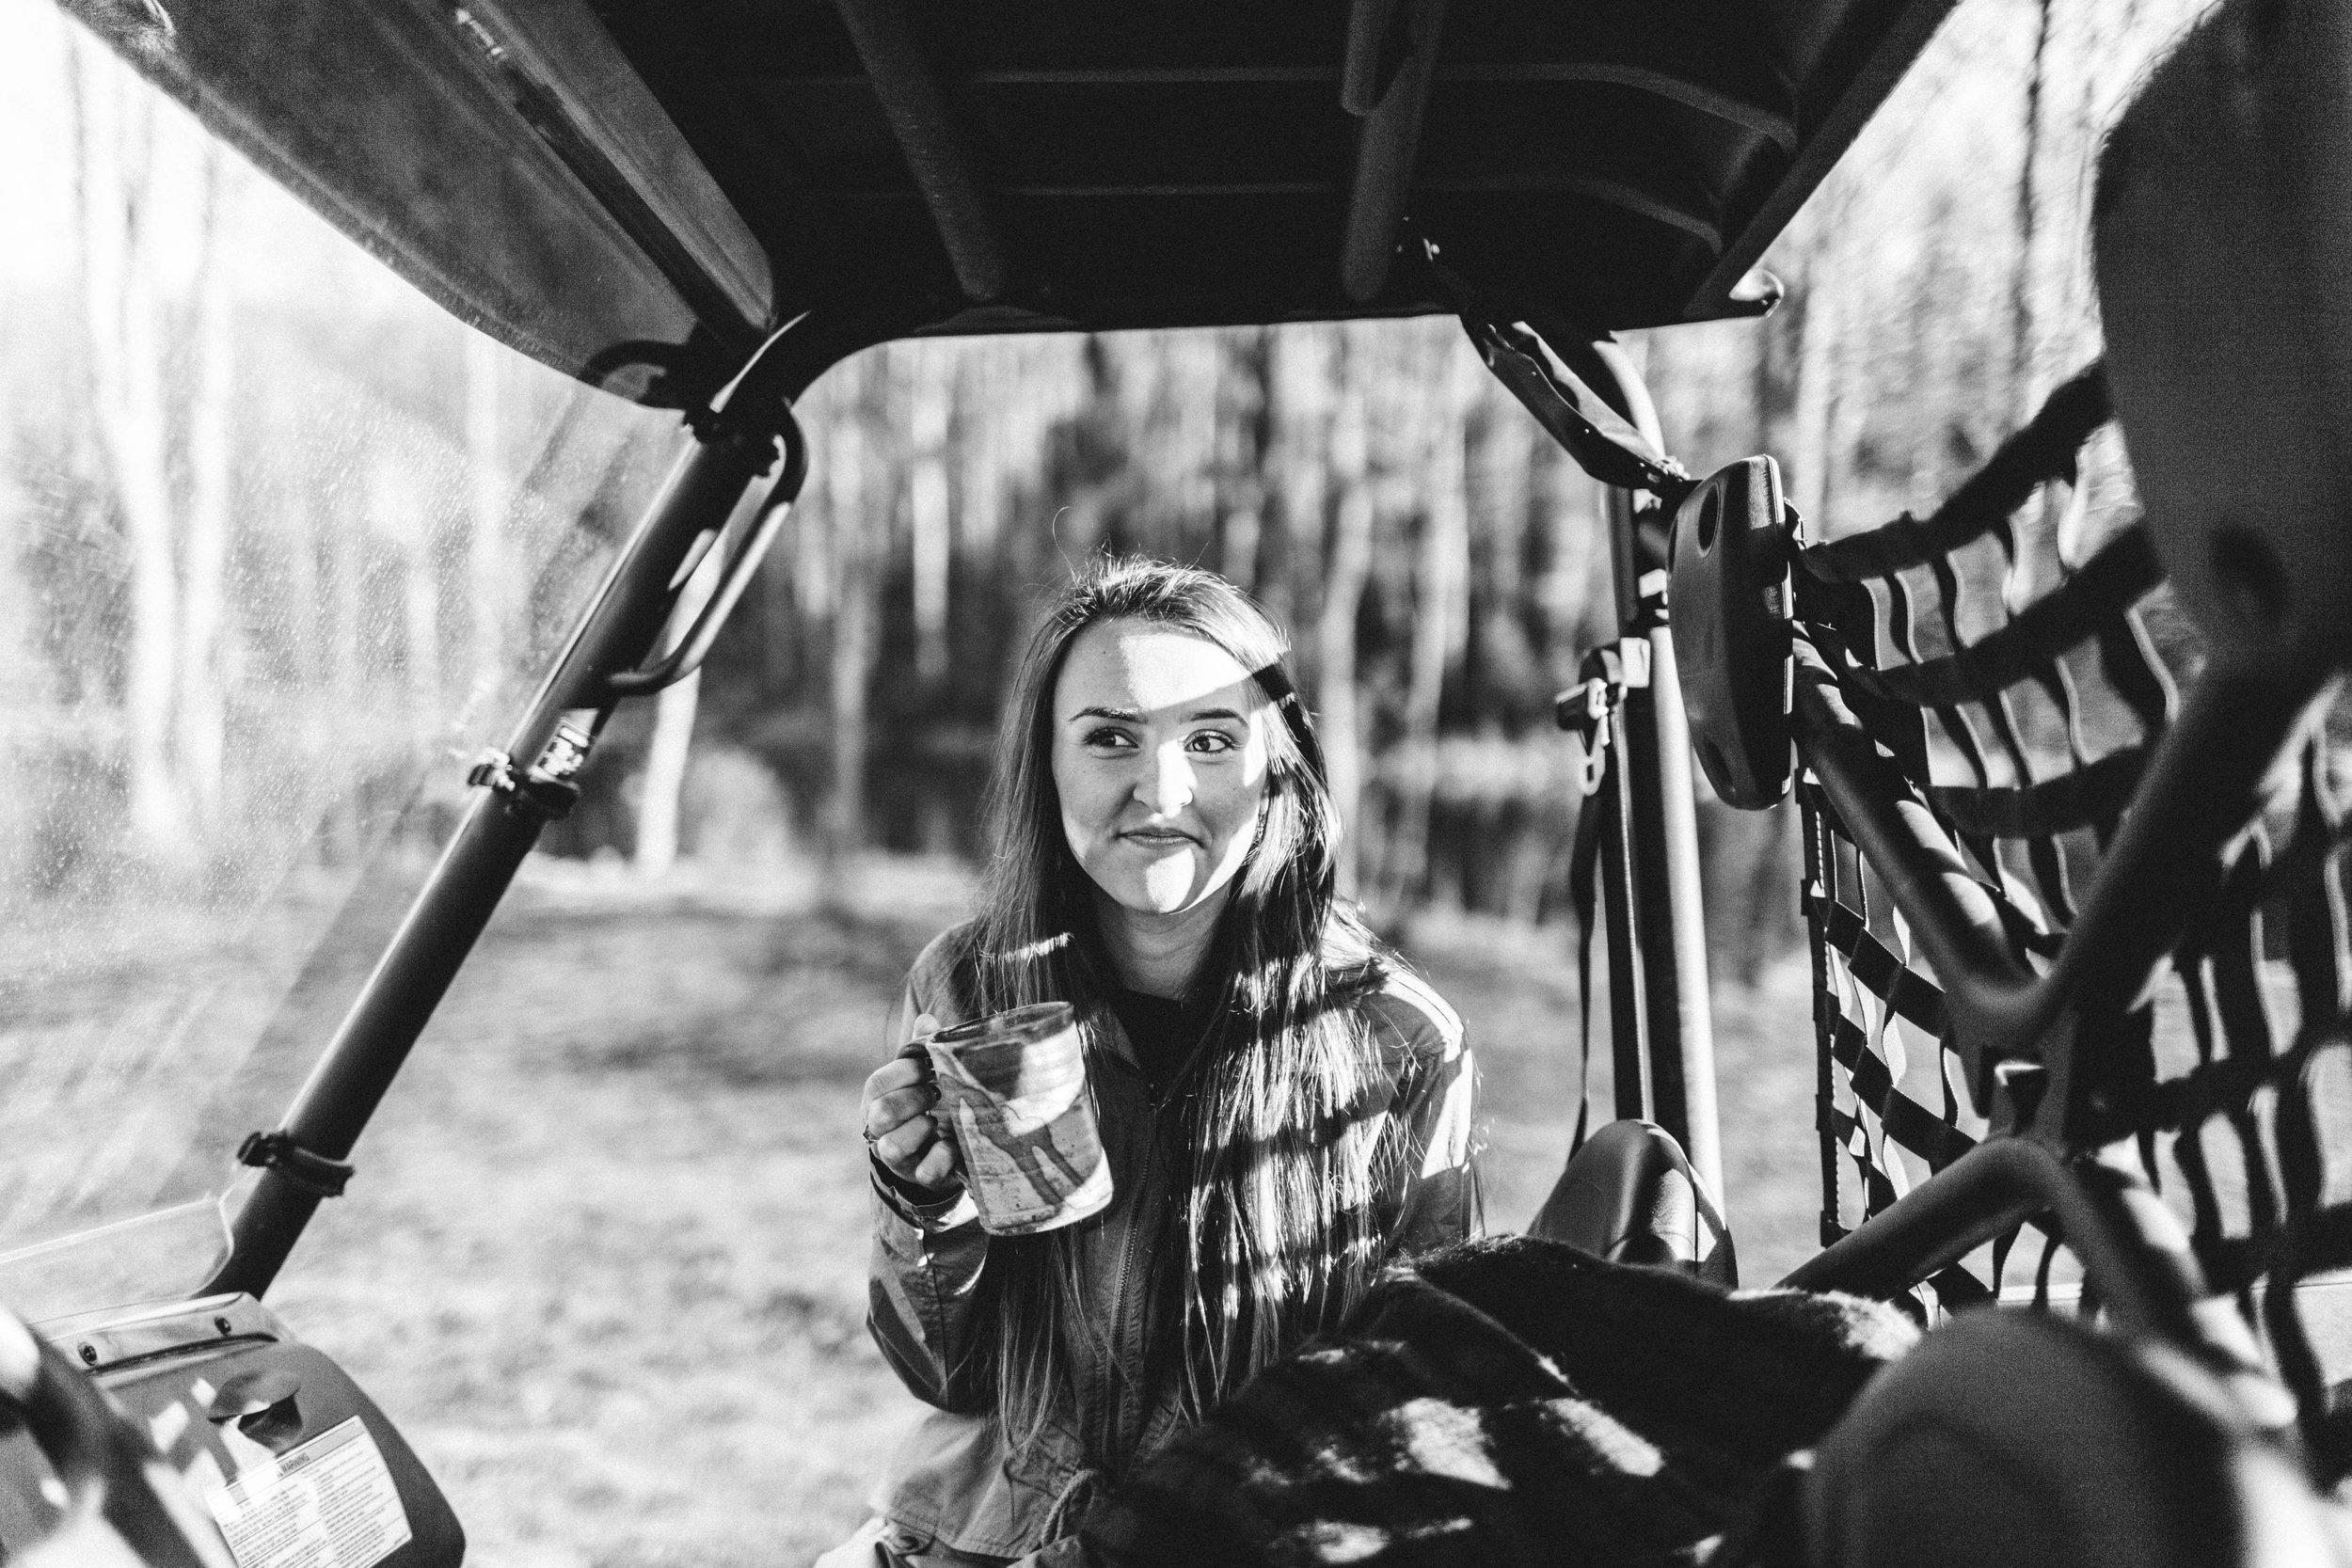 Horse Farm Engagment - Sabrina Leigh Studios - Northern Michigan Wedding Photographer 26.jpg